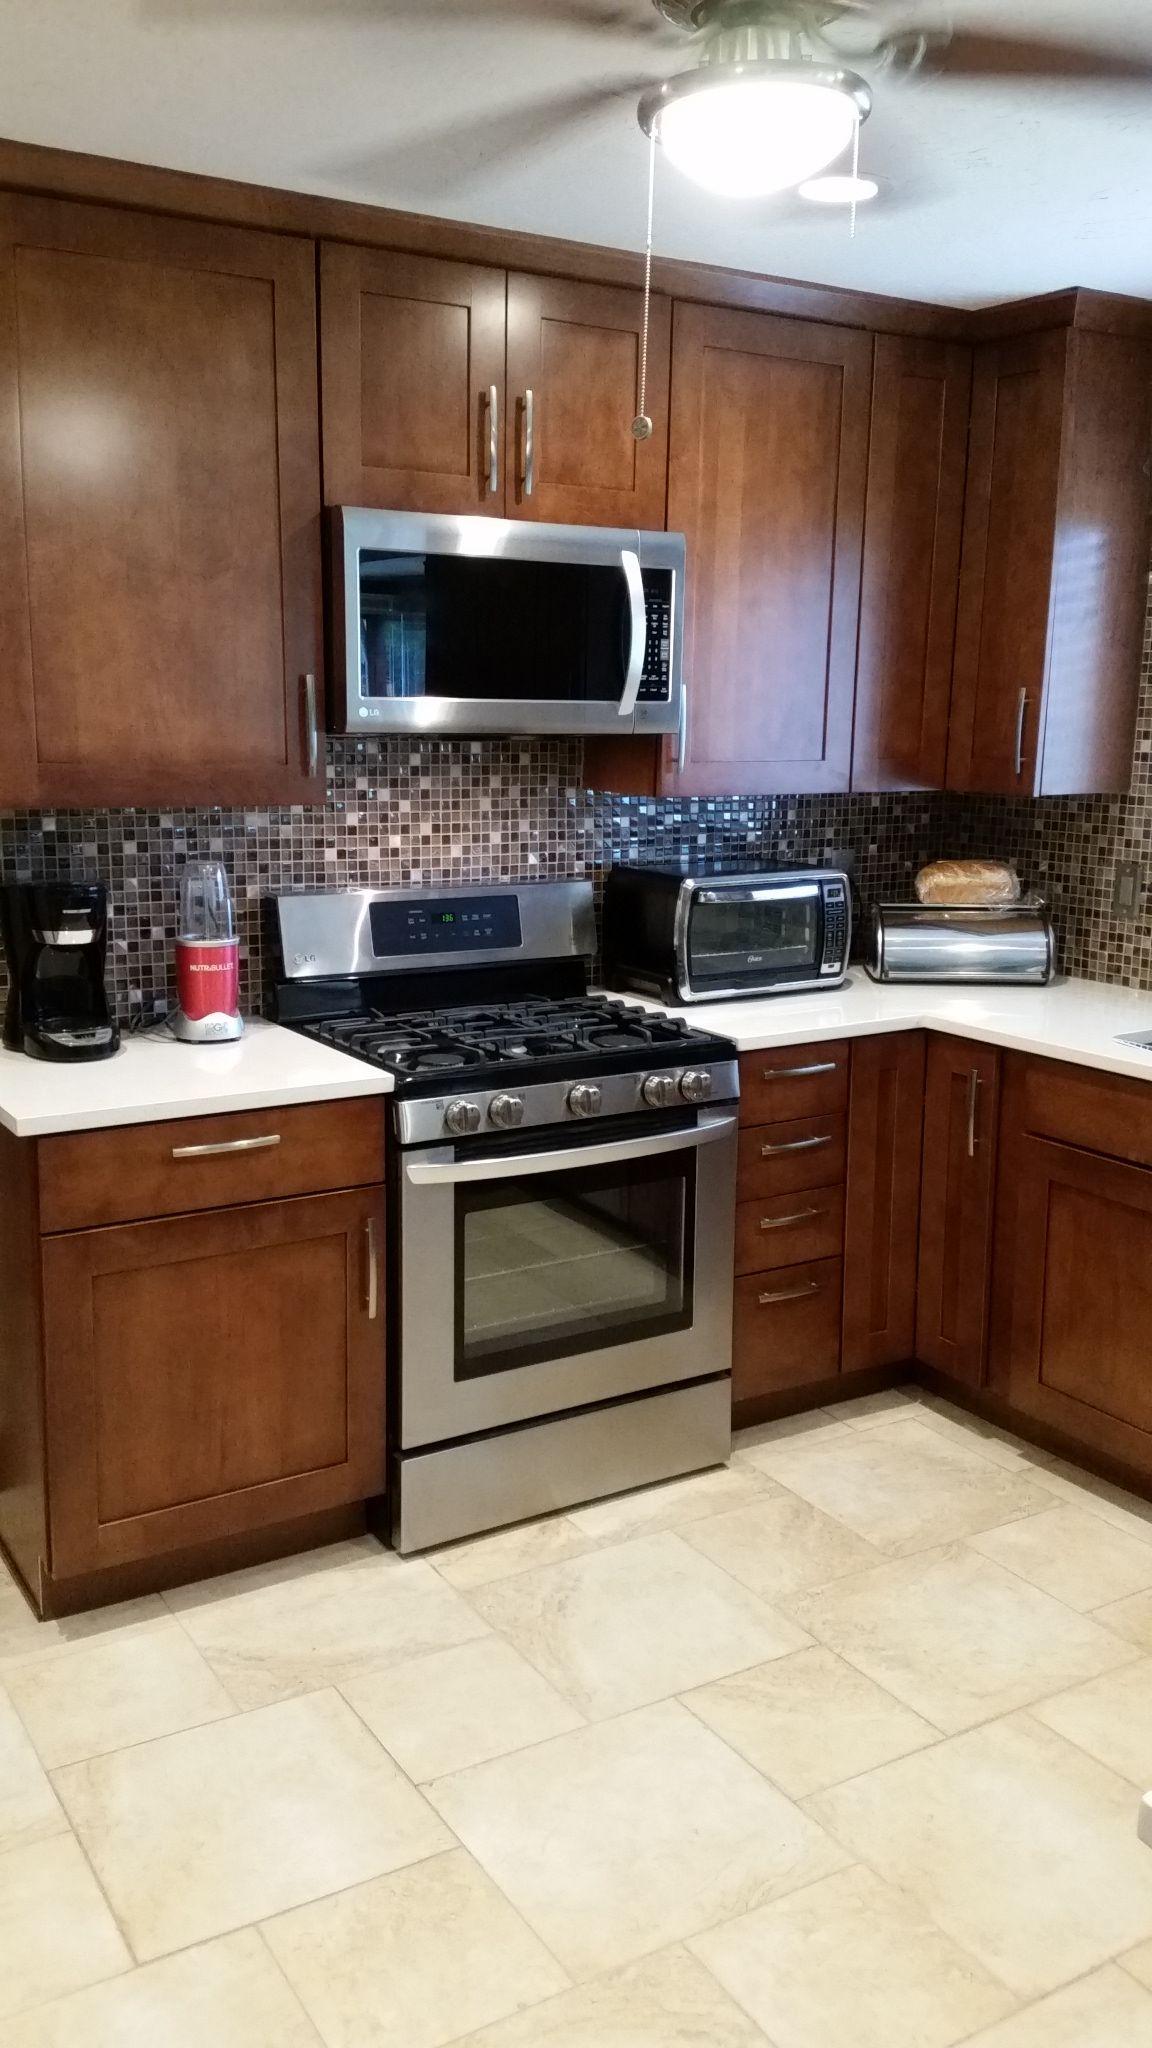 Best My Finished Kitchen Lg Gas Range Kraft Maid Cabinets 400 x 300